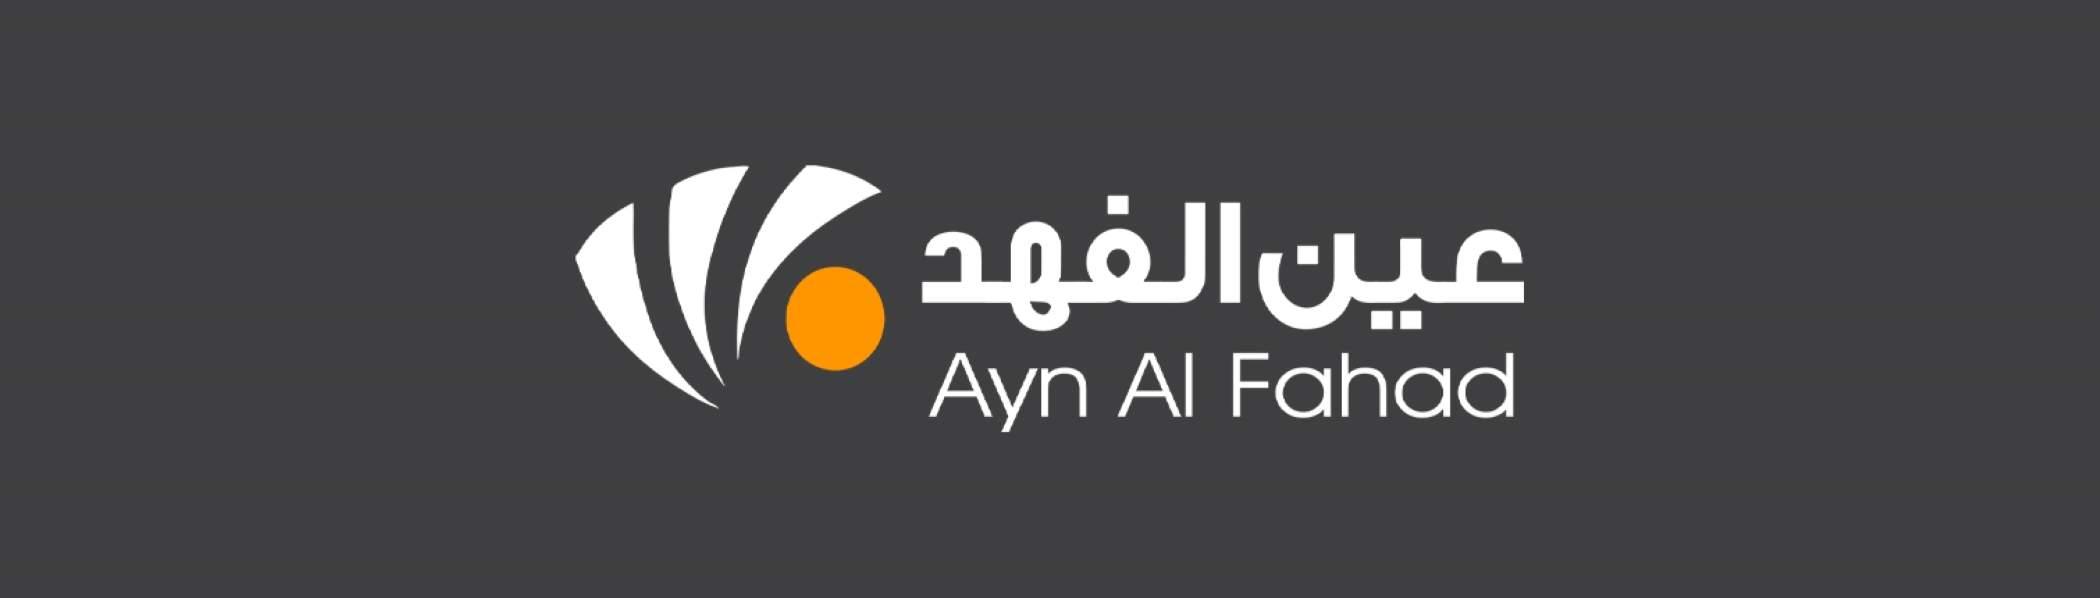 Ayn Al-Fahad